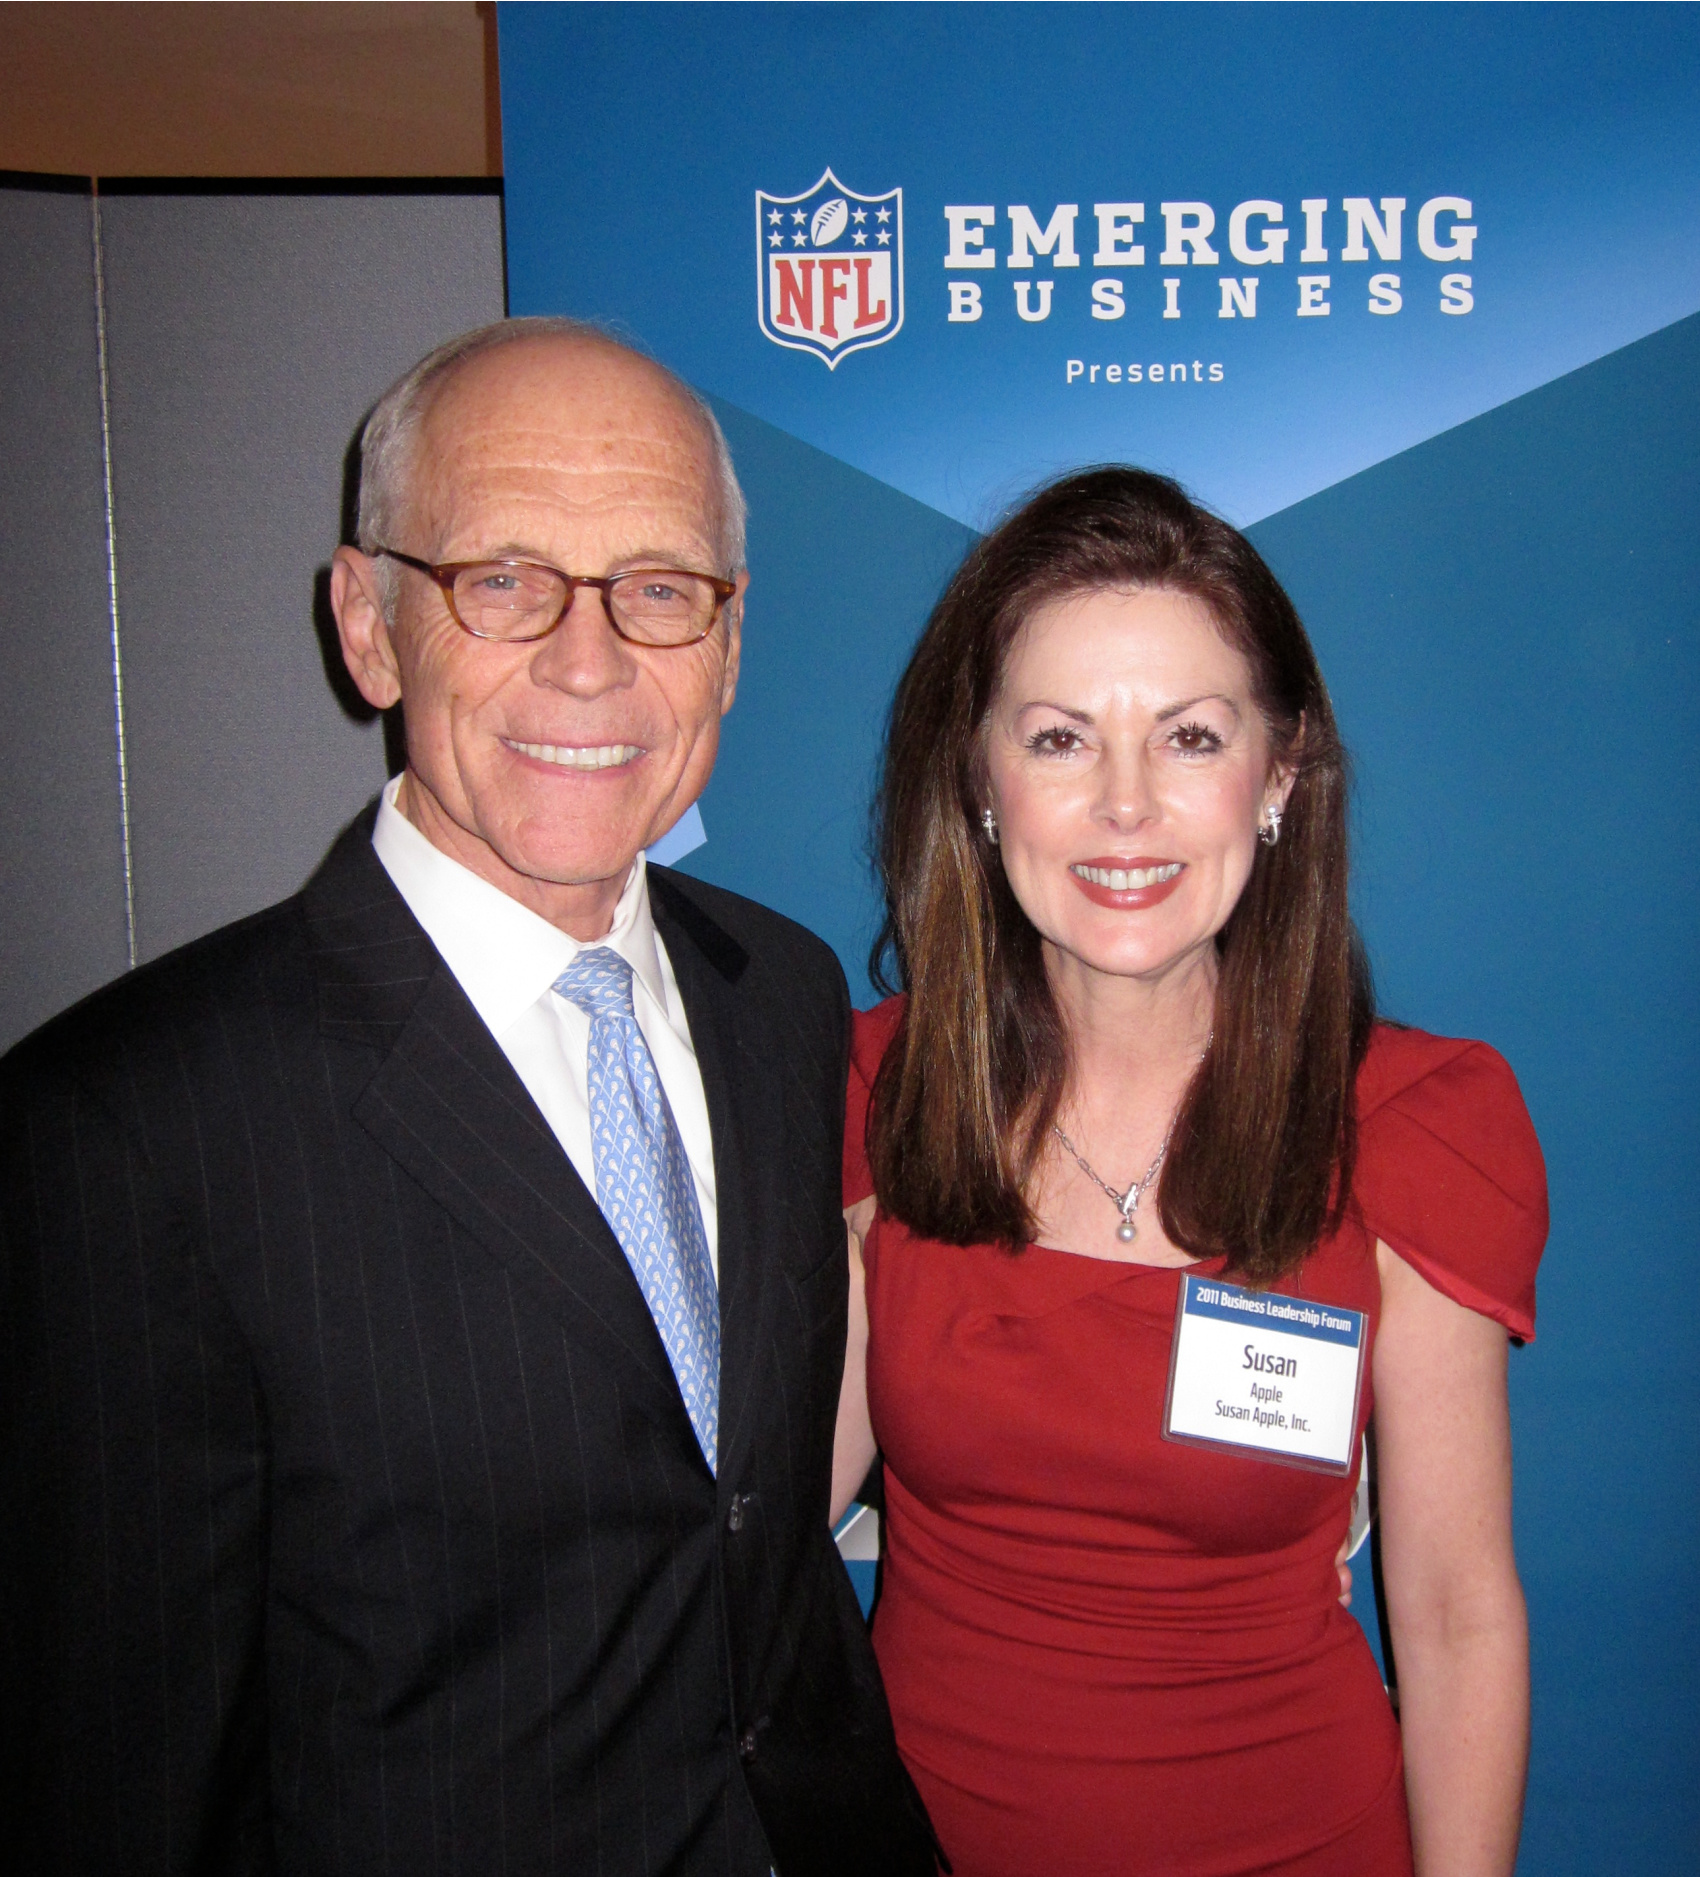 NFL Emerging Business Program